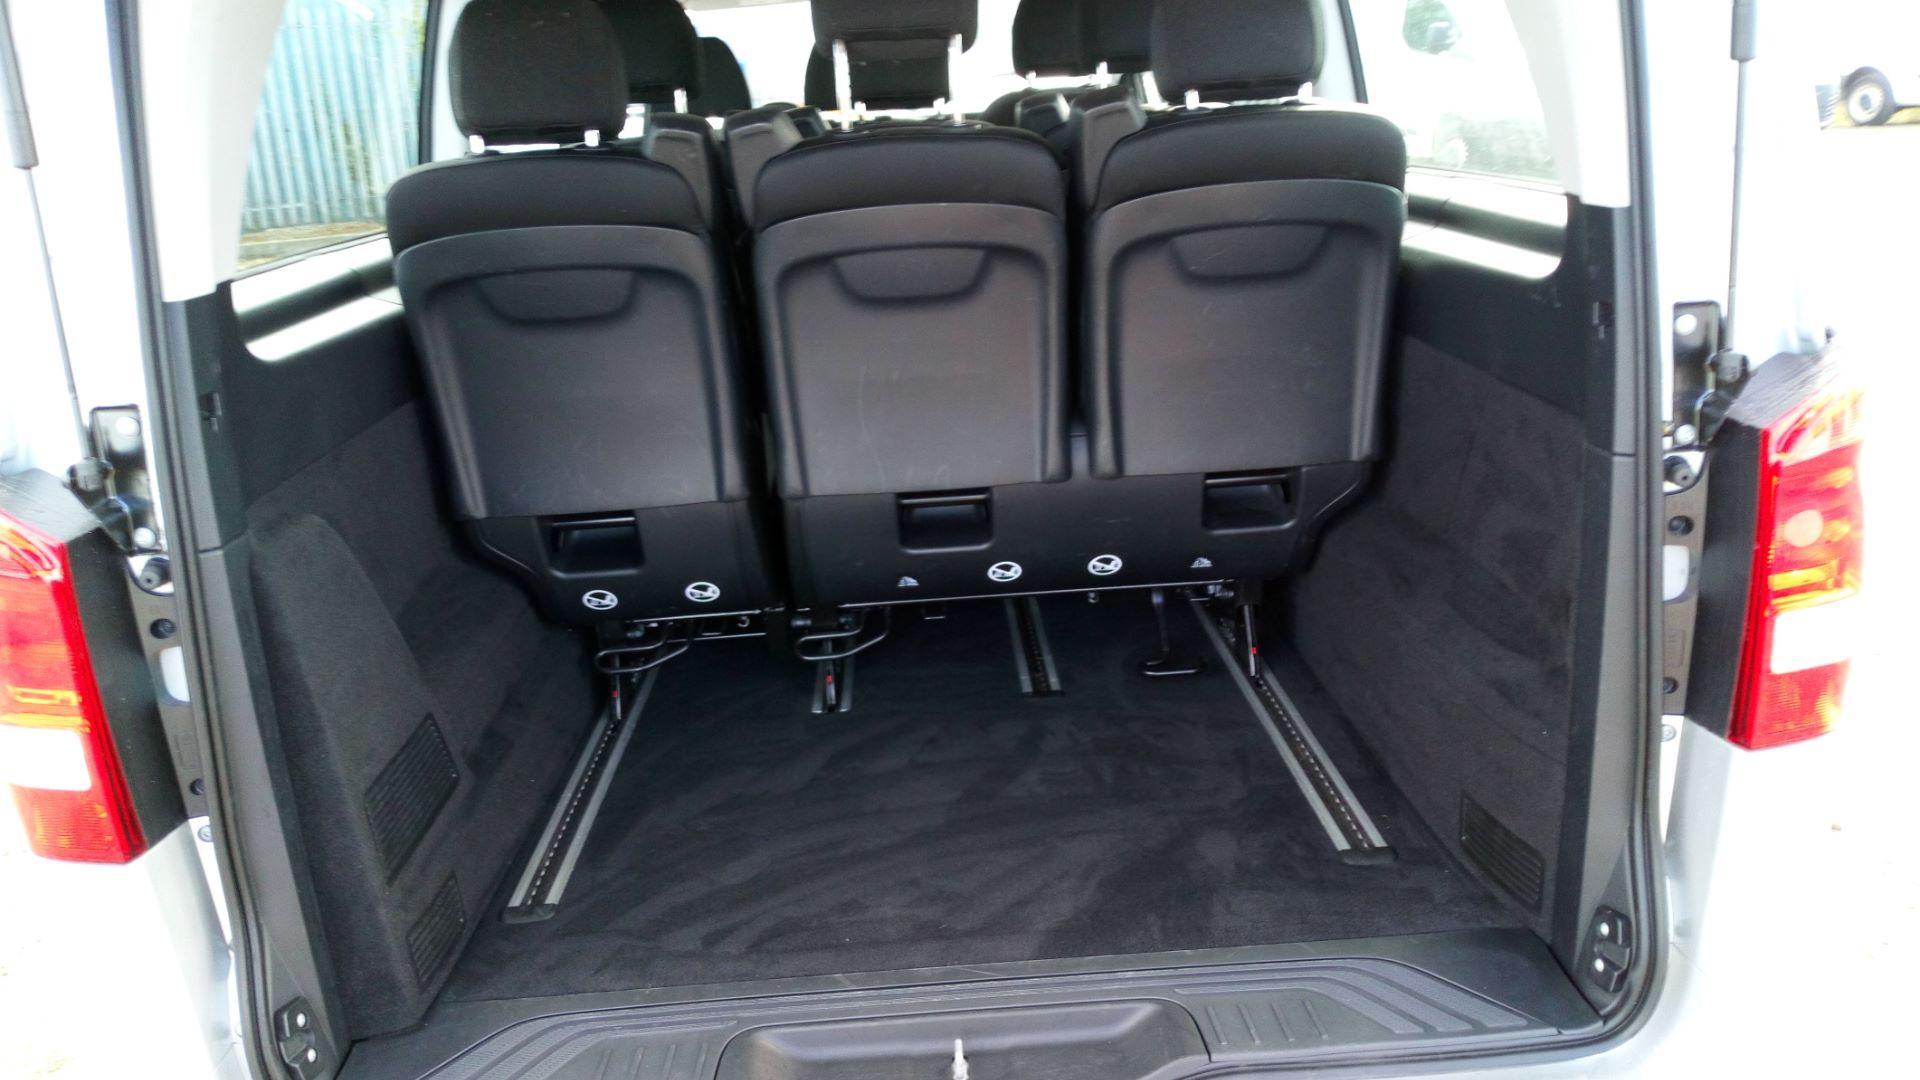 2019 Mercedes-Benz Vito 119 Cdi Select 8-Seater 7G-Tronic (KR19UZO) Image 8